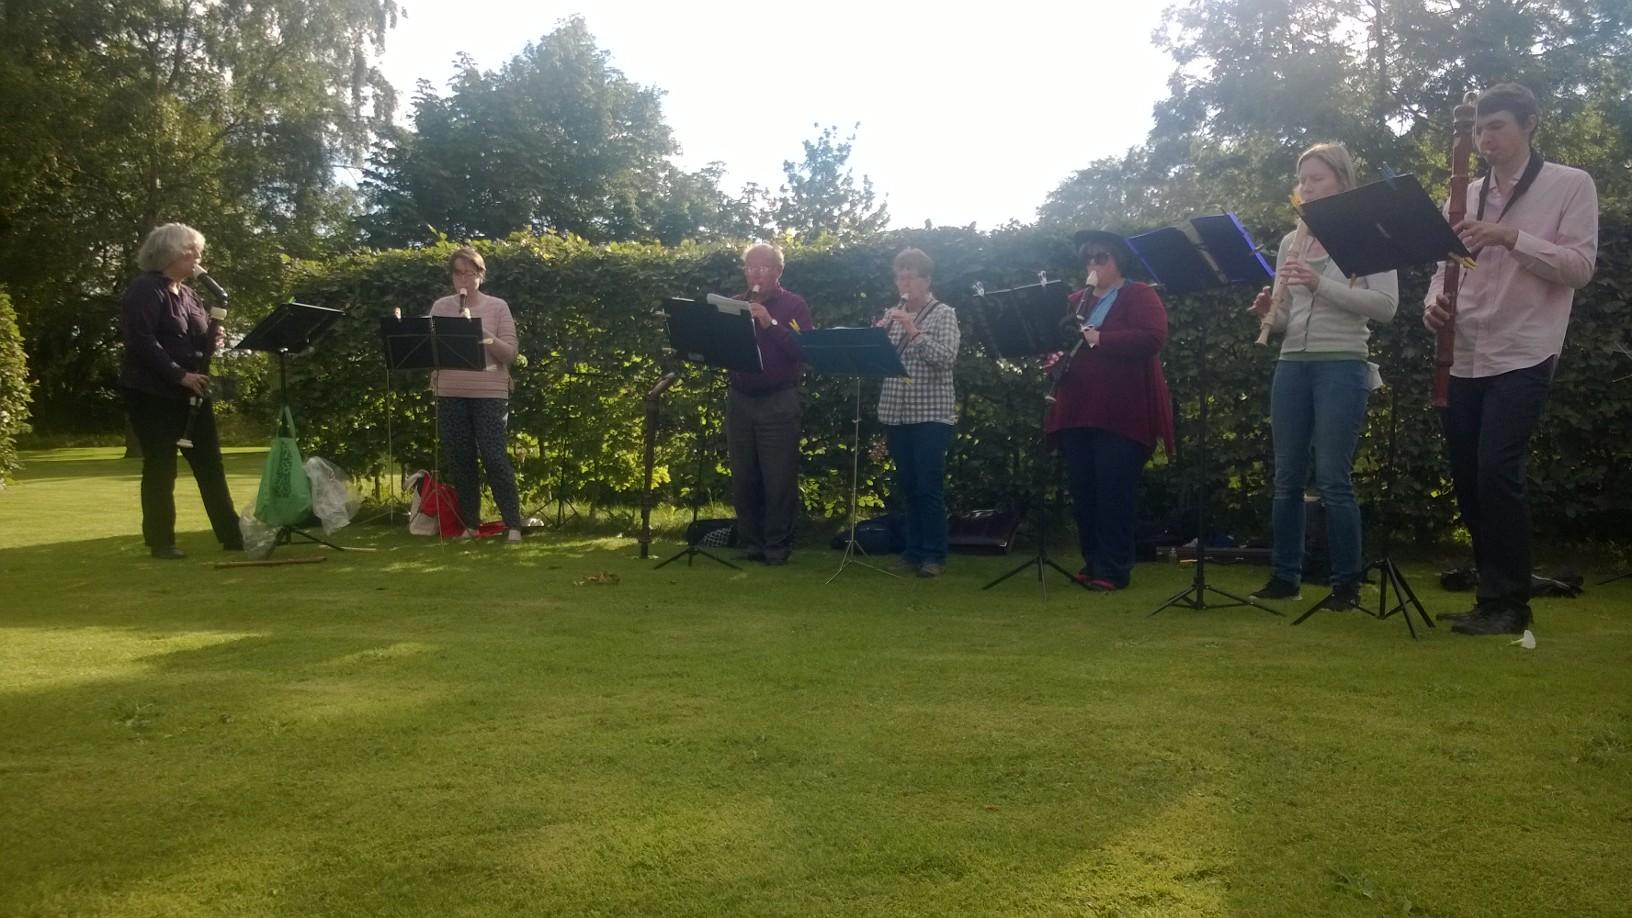 Handlebards at Felton Park - Felton Music Ensemble